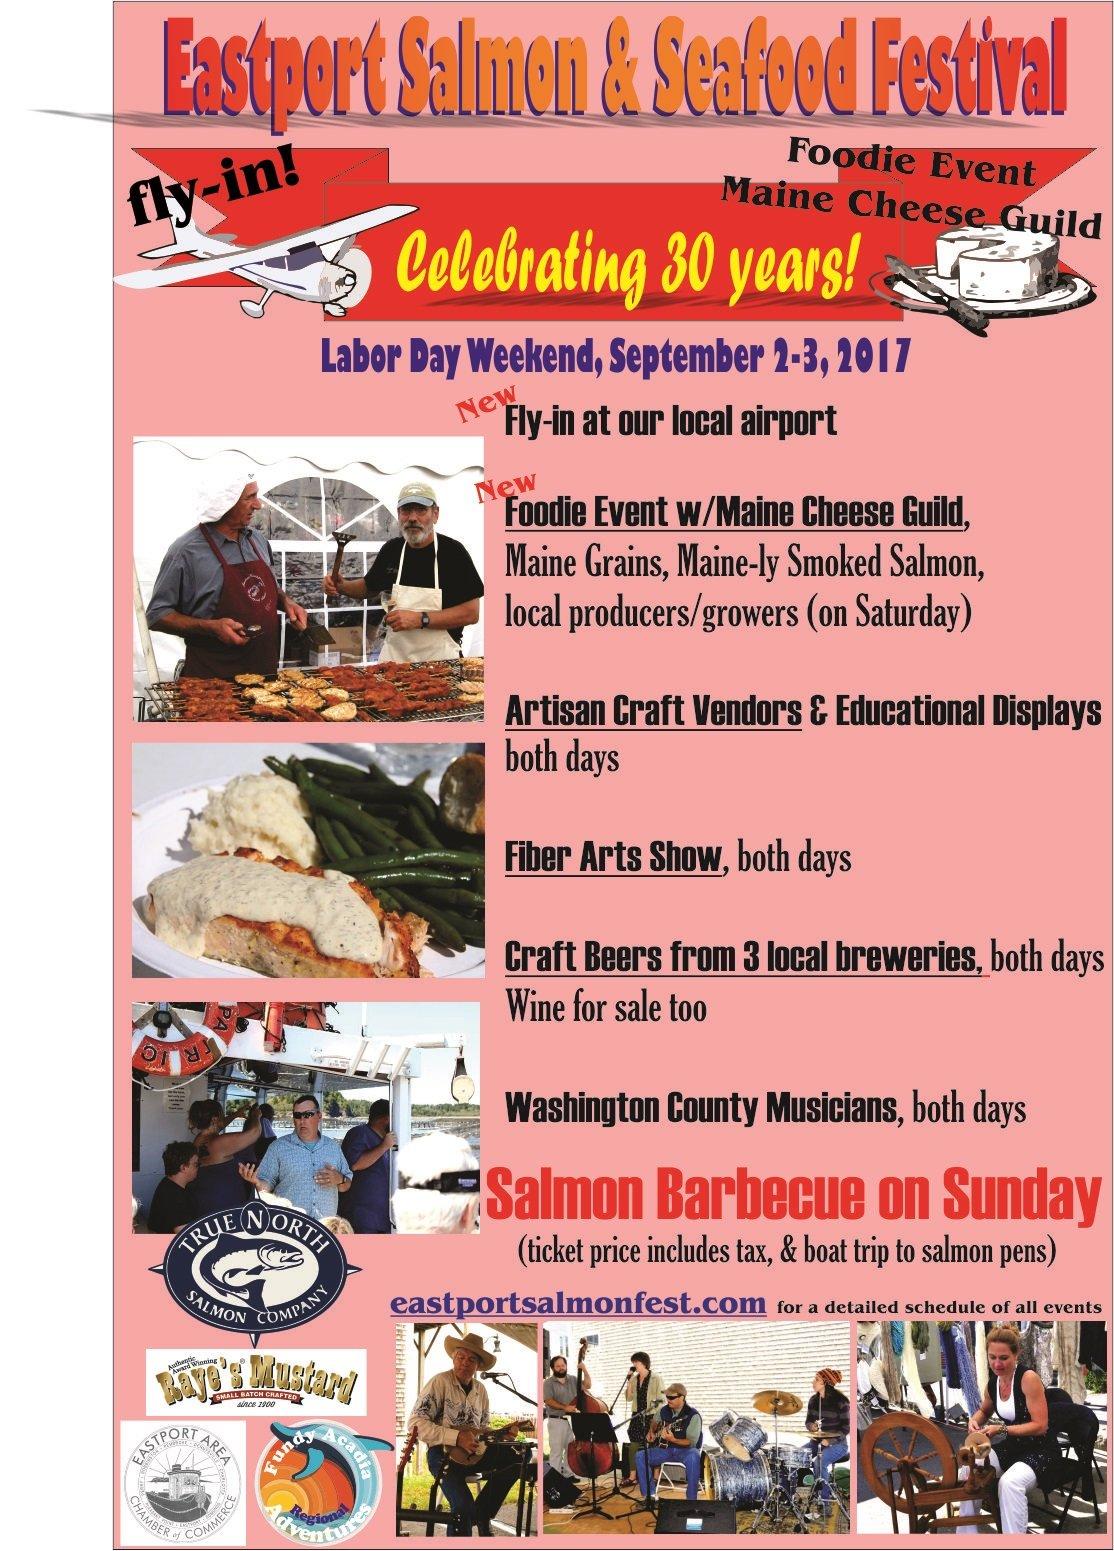 Eastport Salmon and Seafood Festival - ARTSIPELAGO